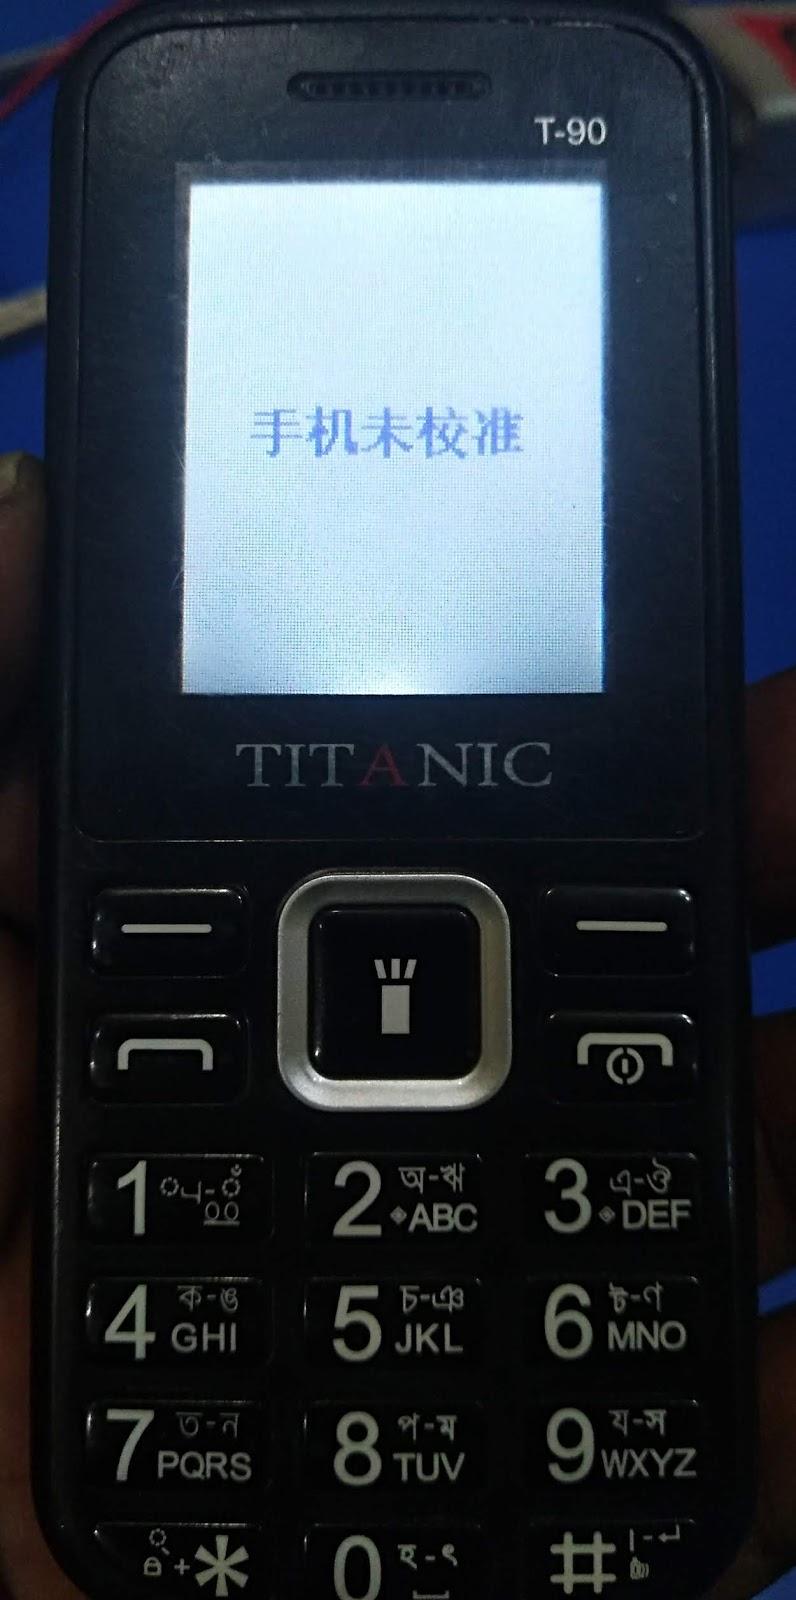 TITANIC T-90 MT6261 FLASH FILE 100% TESTED - Sharif Telecom